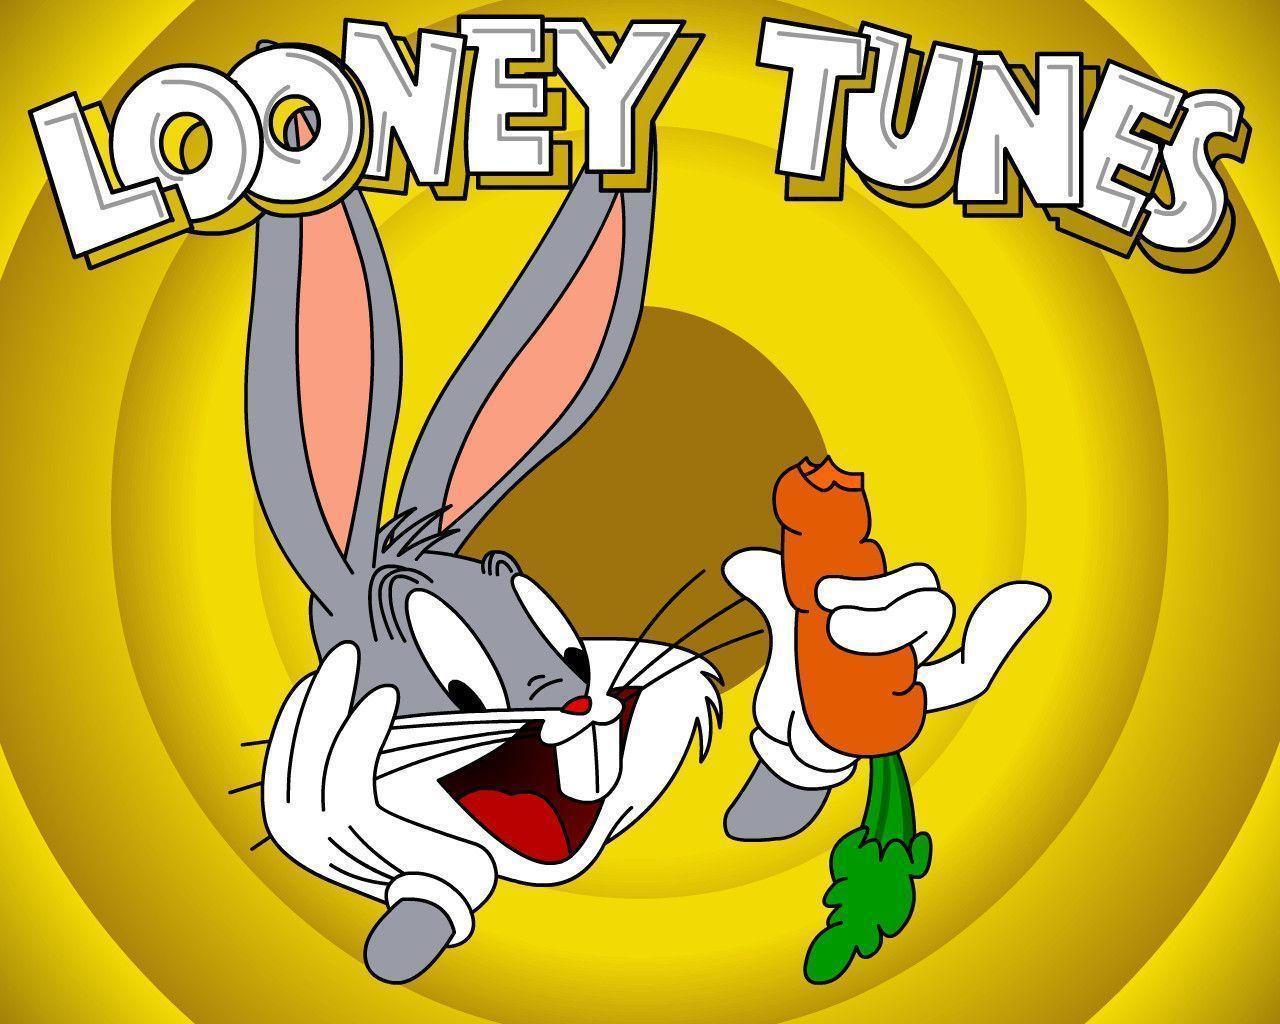 Looney tunes background art